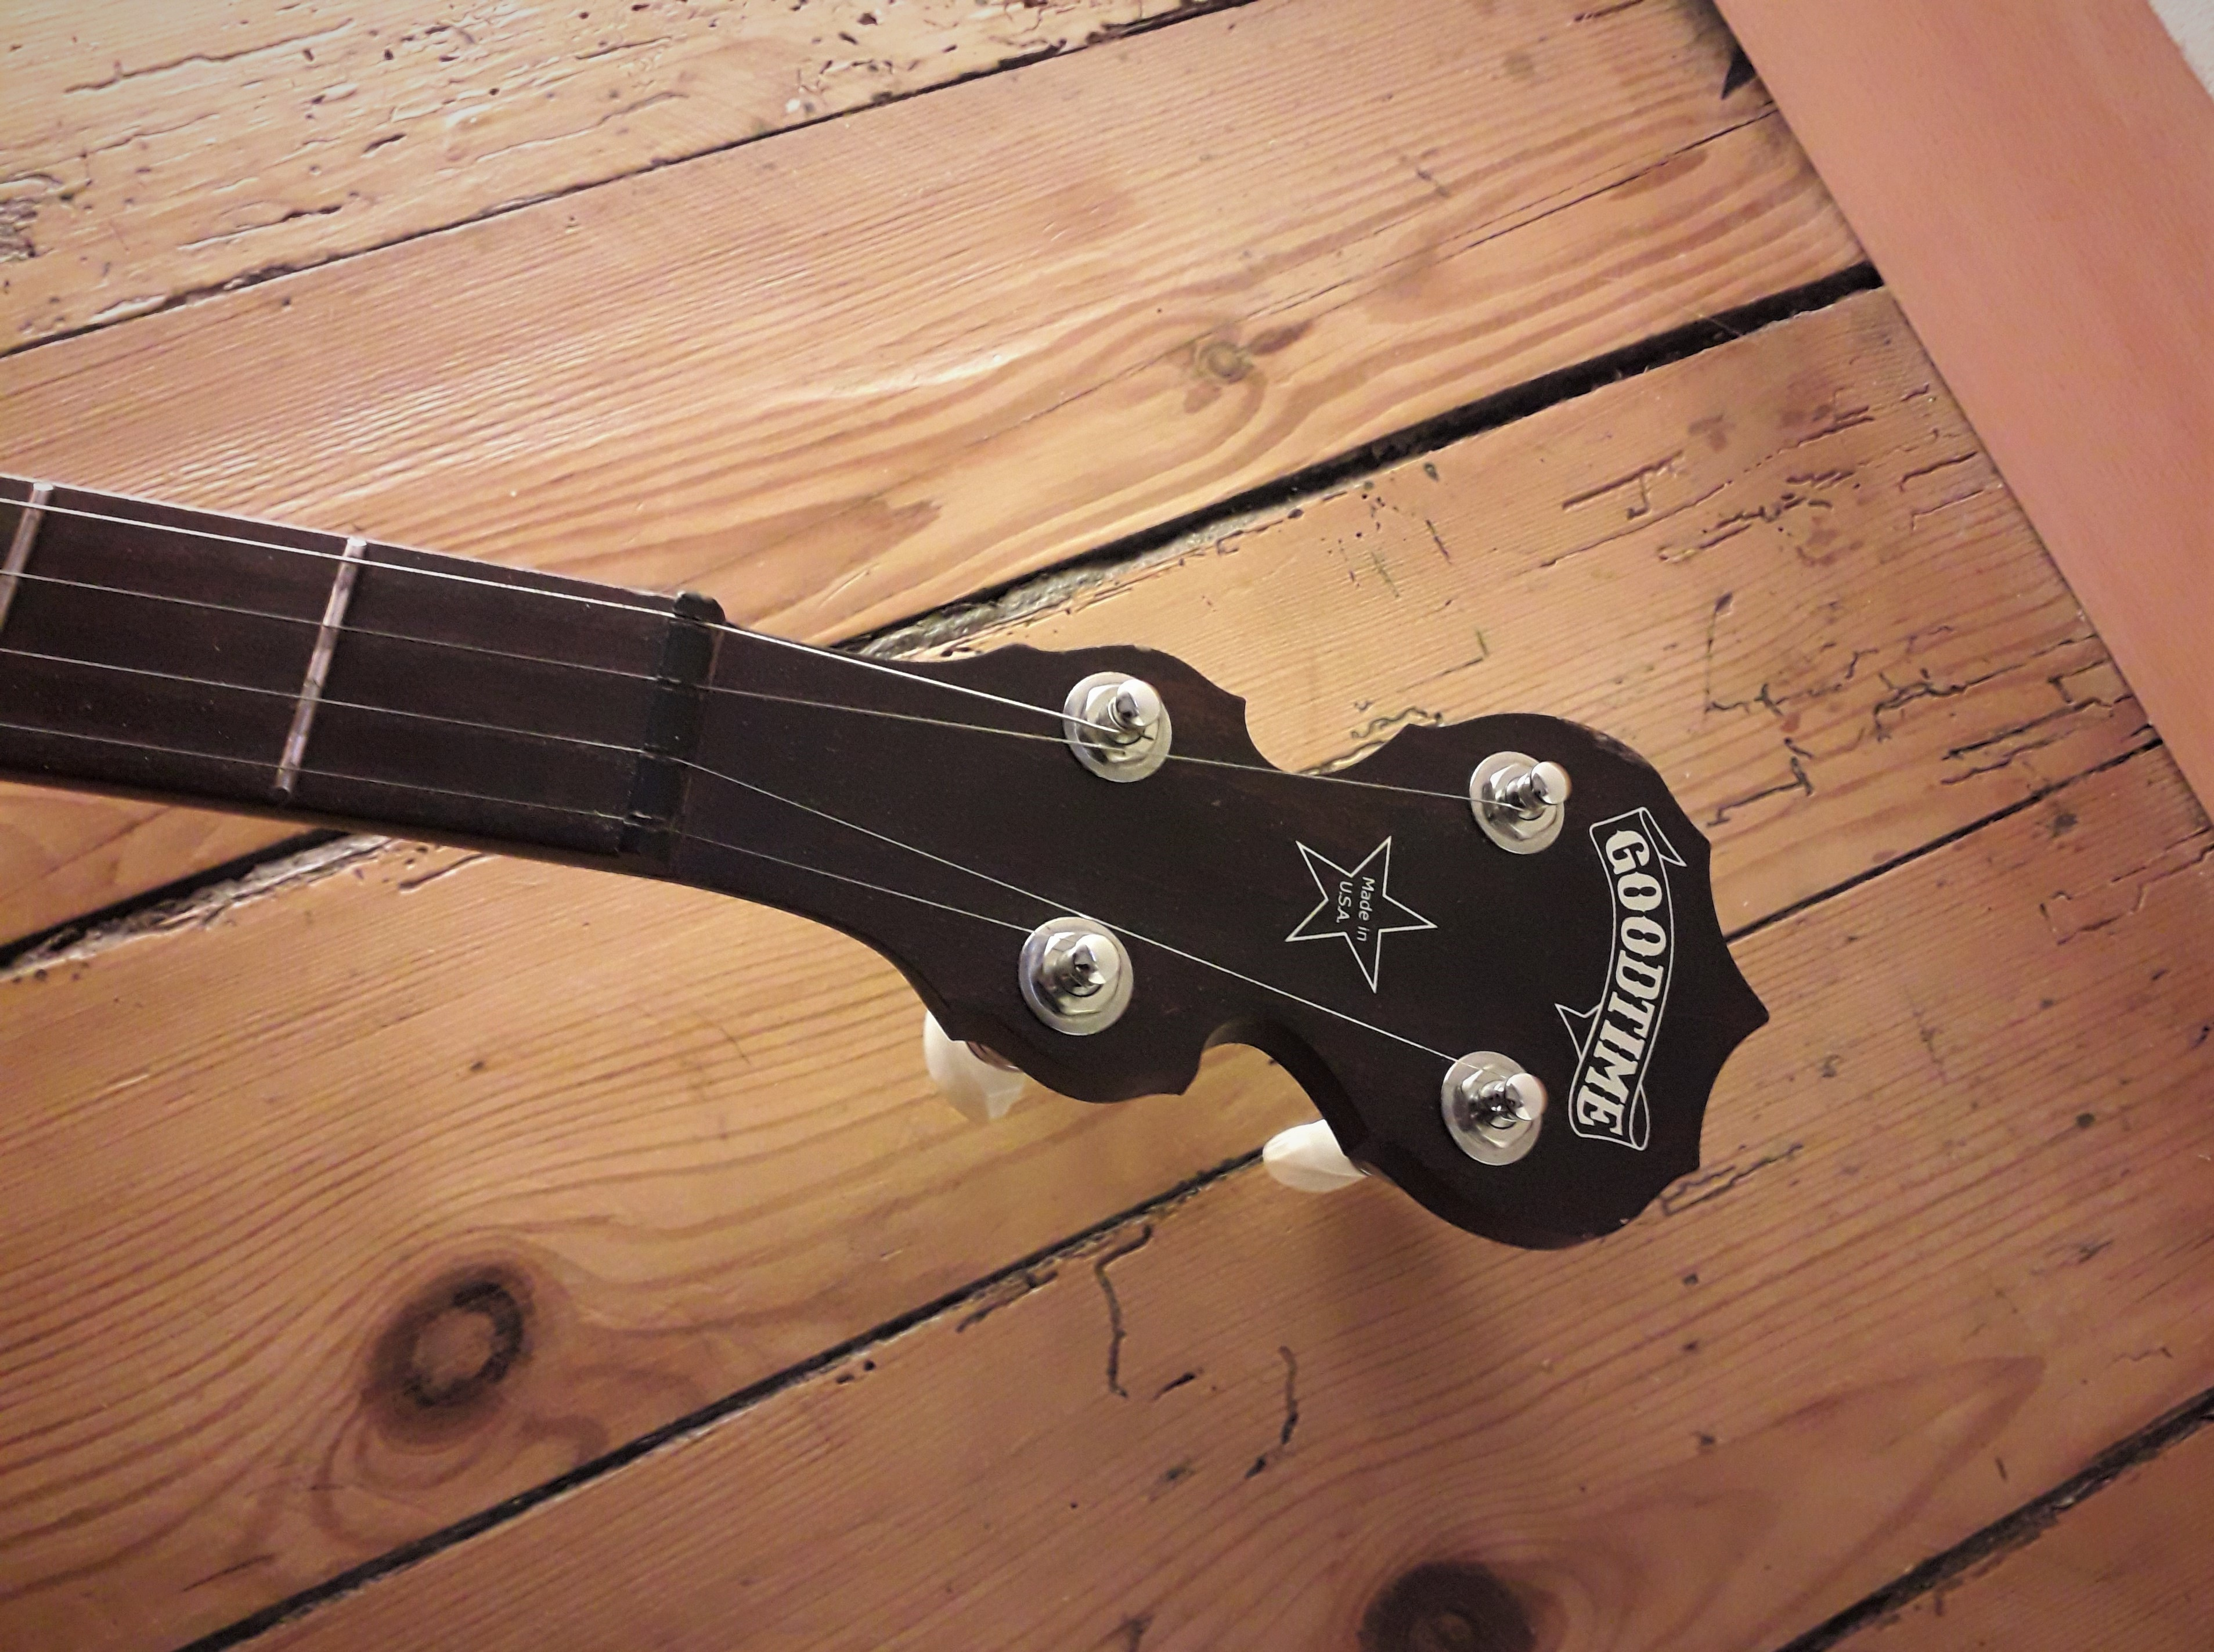 VEGA LITTLE WONDER BANJO - Deering Vega Little Wonder Banjo